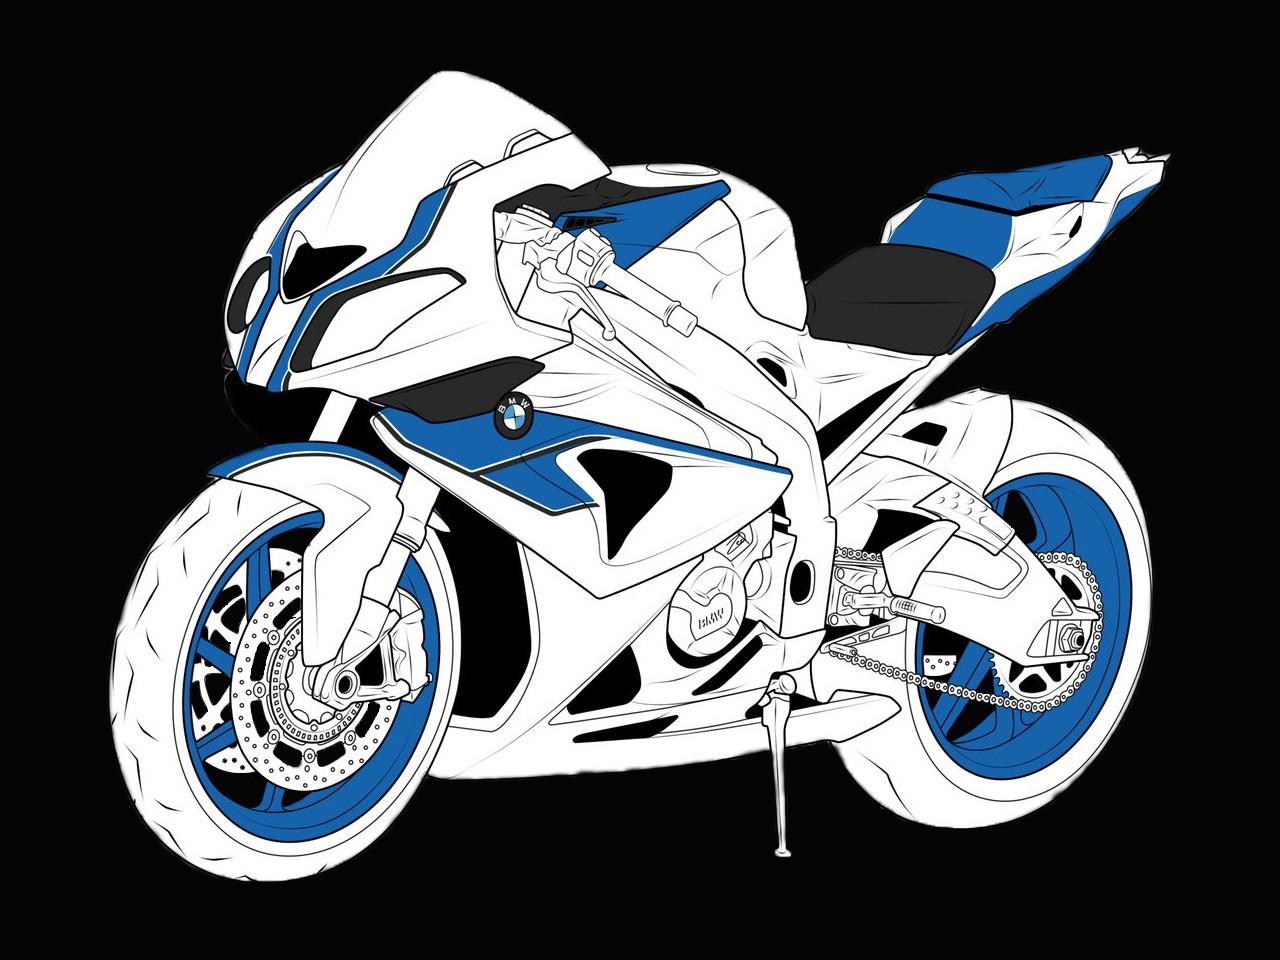 Wallpaper Drawing Illustration Bmw Motorcycle Vehicle Cartoon S1000rr Hp4 Wheel Sketch Freestyle Motocross 1280x960 Nevrast1 292603 Hd Wallpapers Wallhere